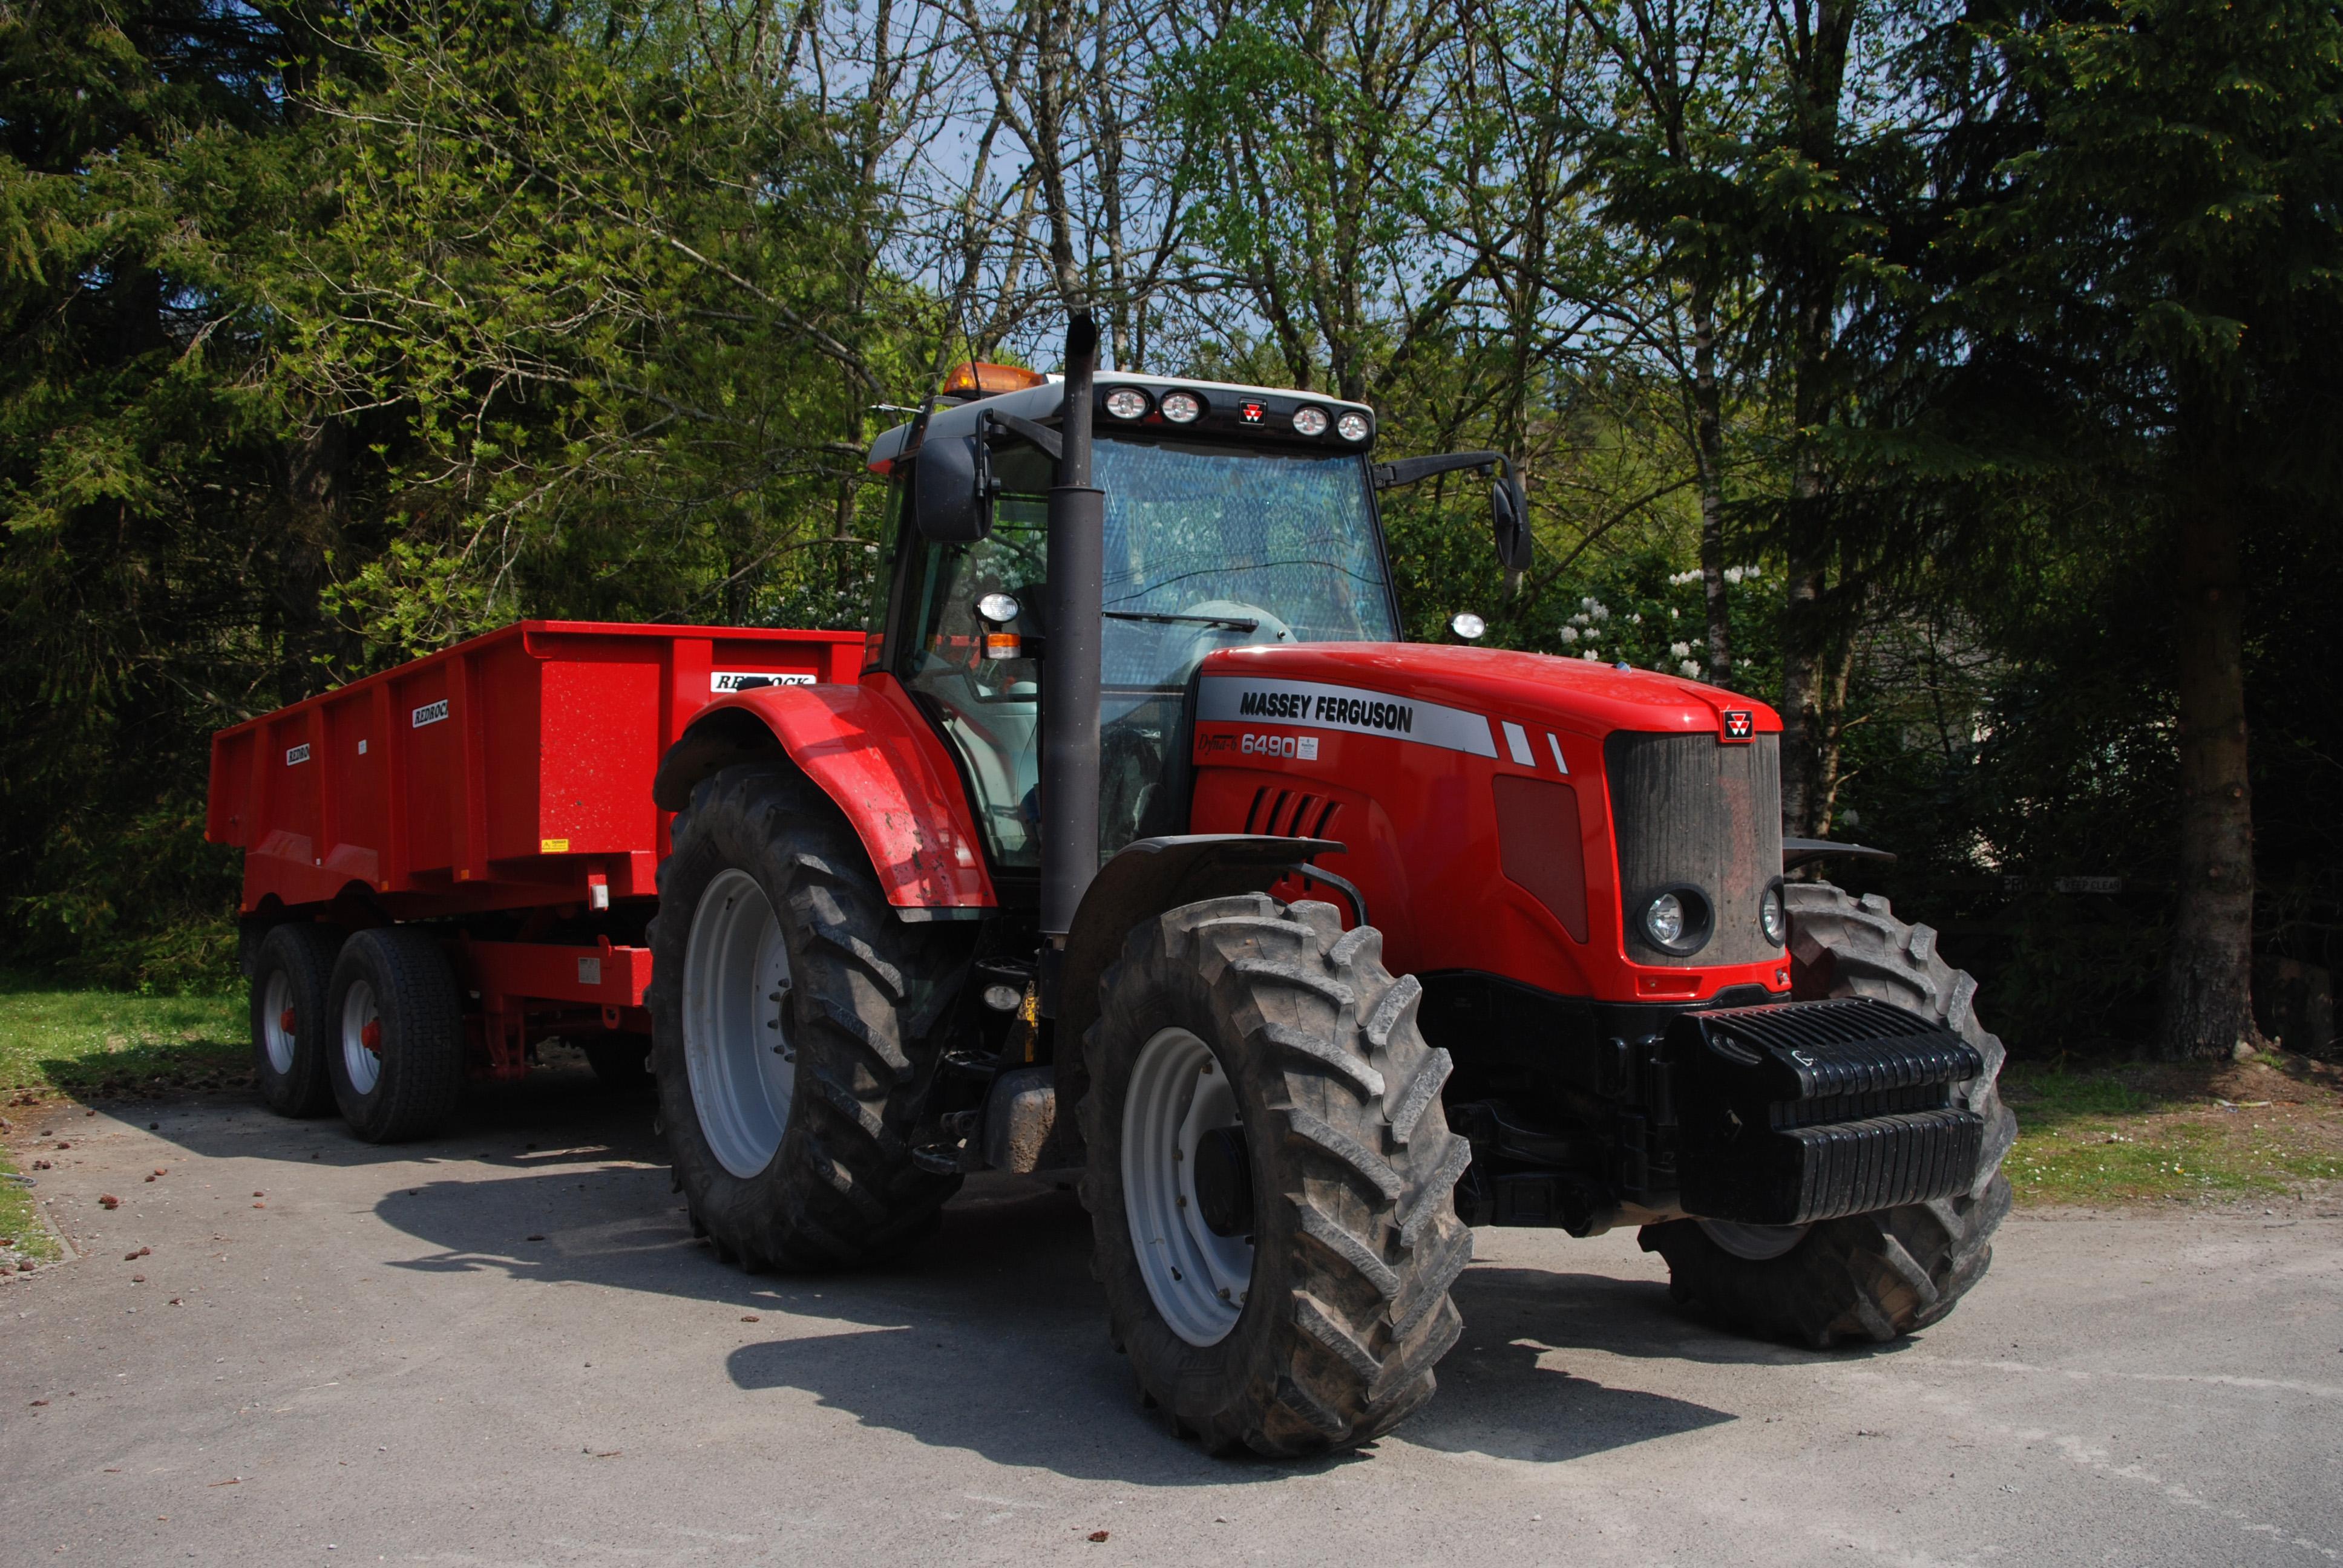 Massey Ferguson 6490 tractor, in 2008